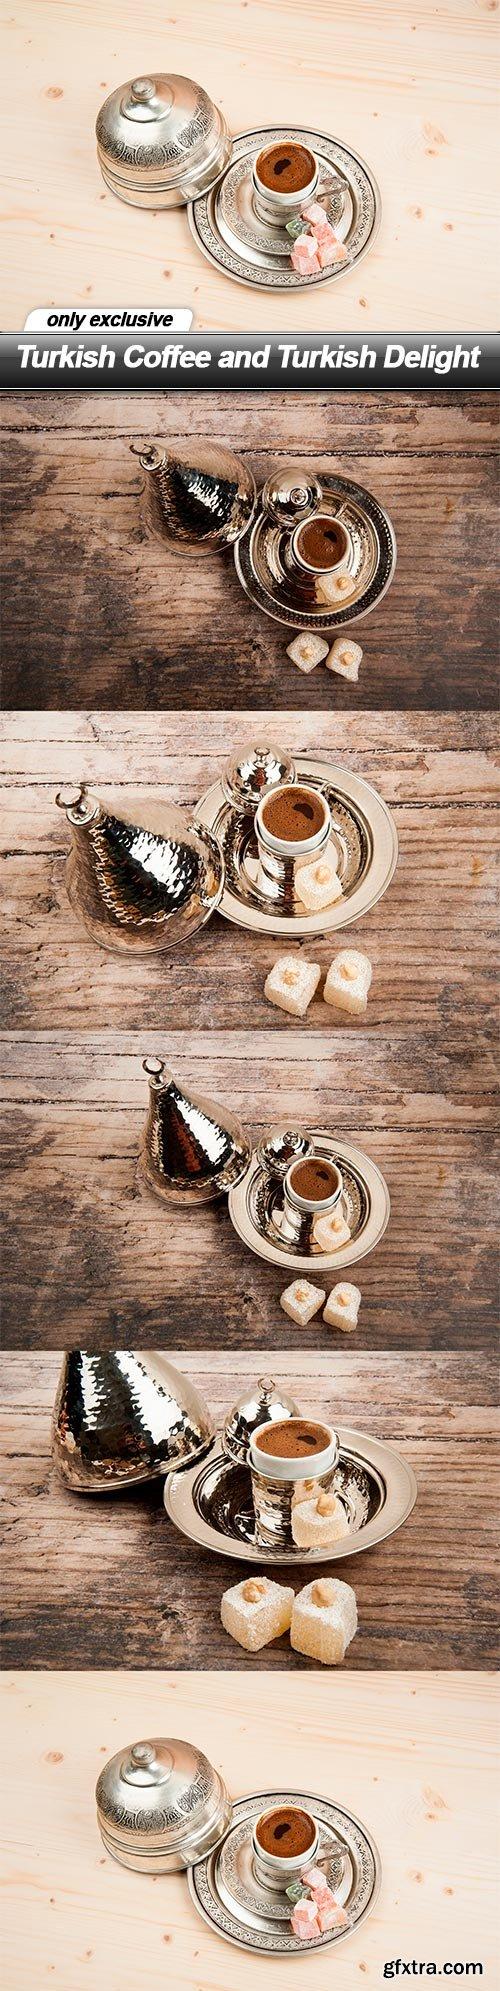 Turkish Coffee and Turkish Delight - 5 UHQ JPEG